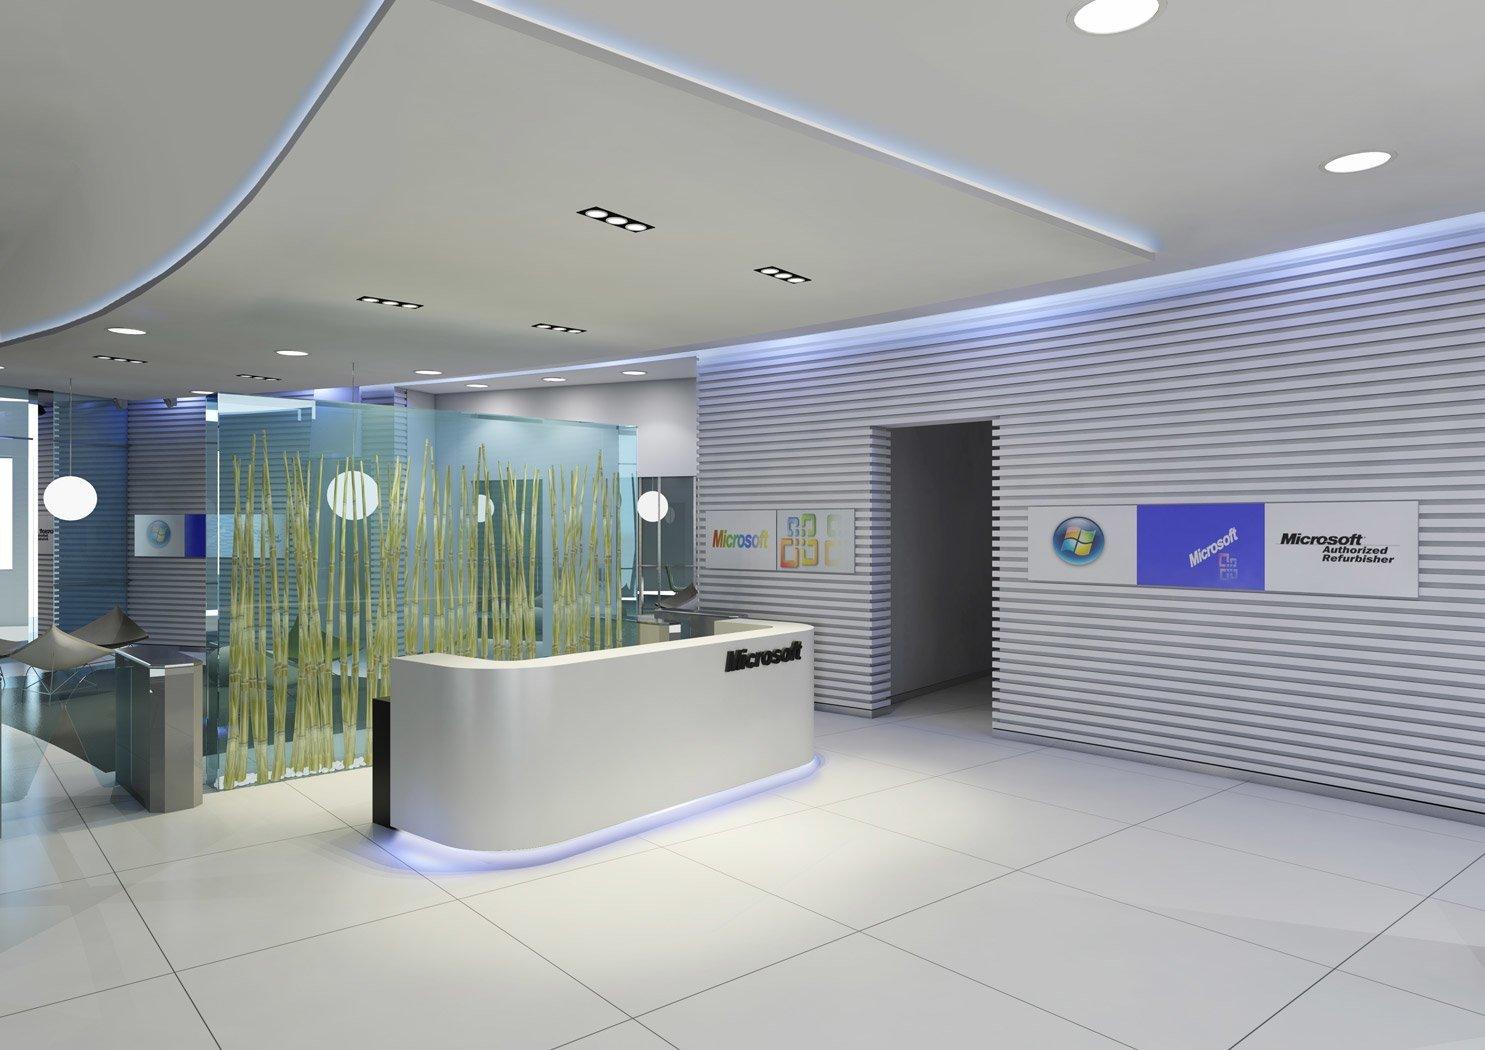 sankalpan architecture interior design